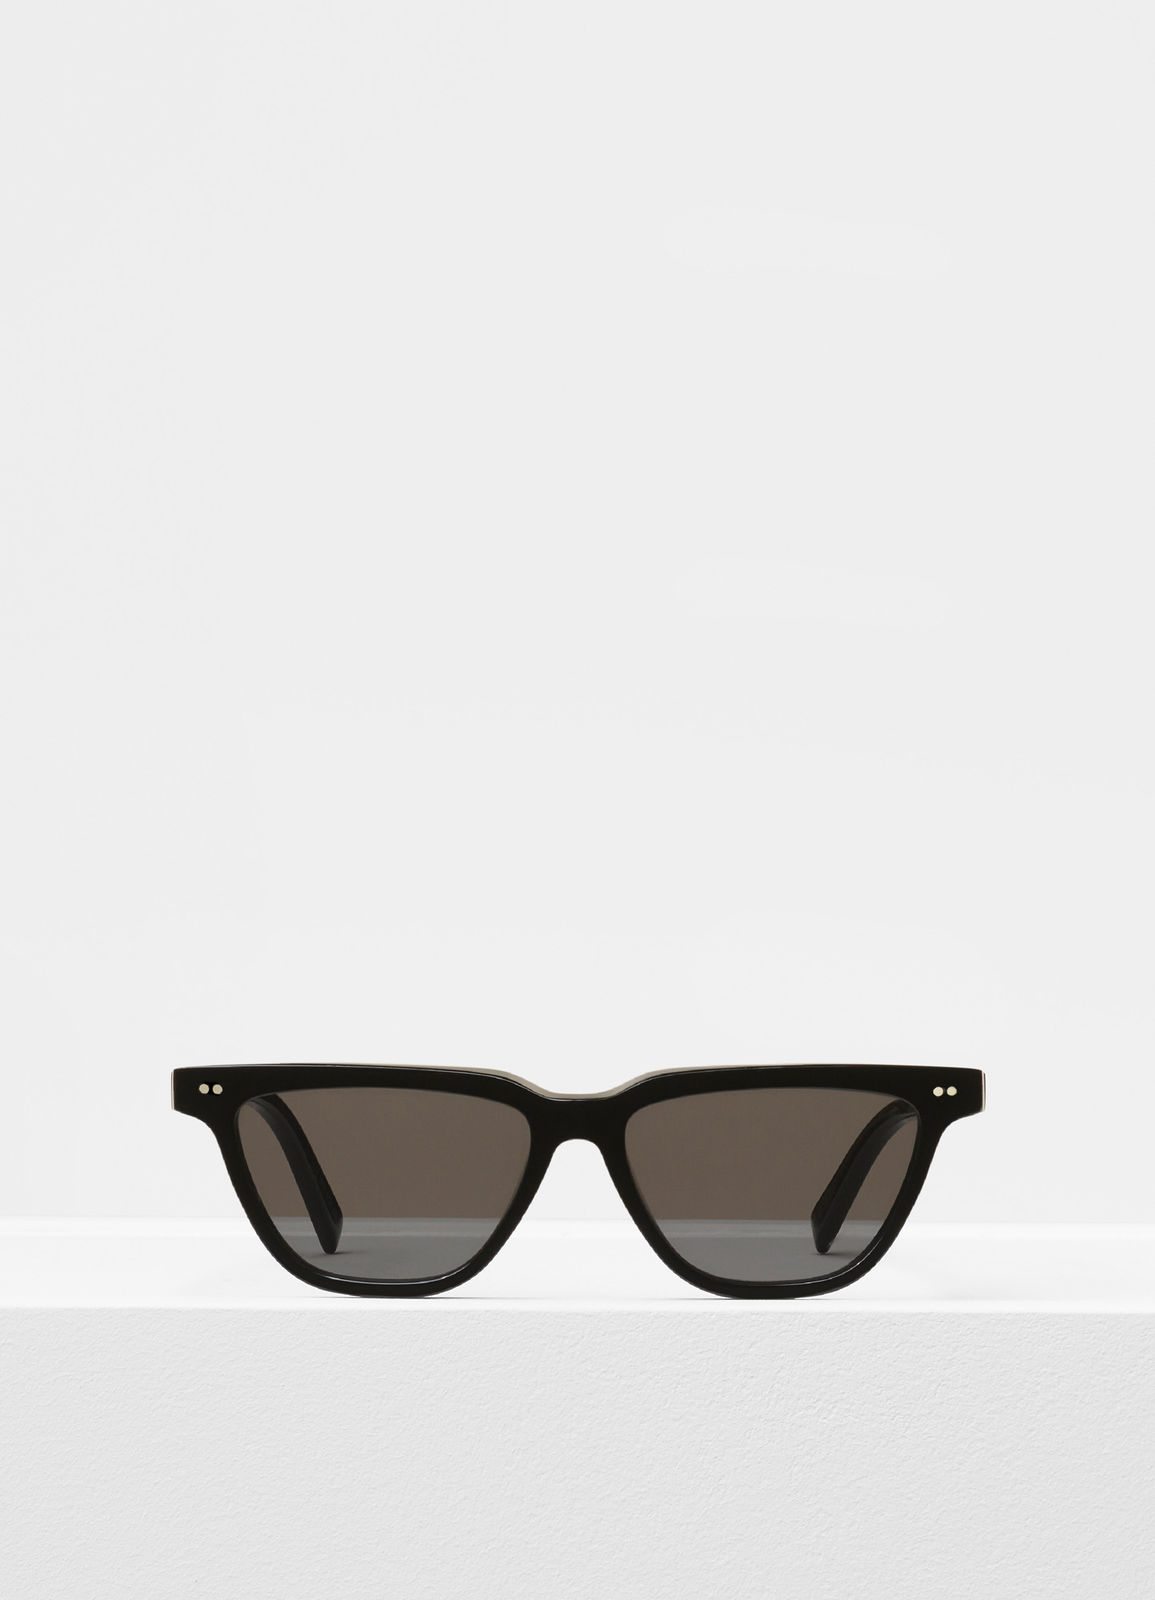 CELINE- CL40023I Sunglasses  £250 (Sold out)  COLOUR: Black  CATEGORY SUN  MATERIAL Combination  SHAPE Cat Eye